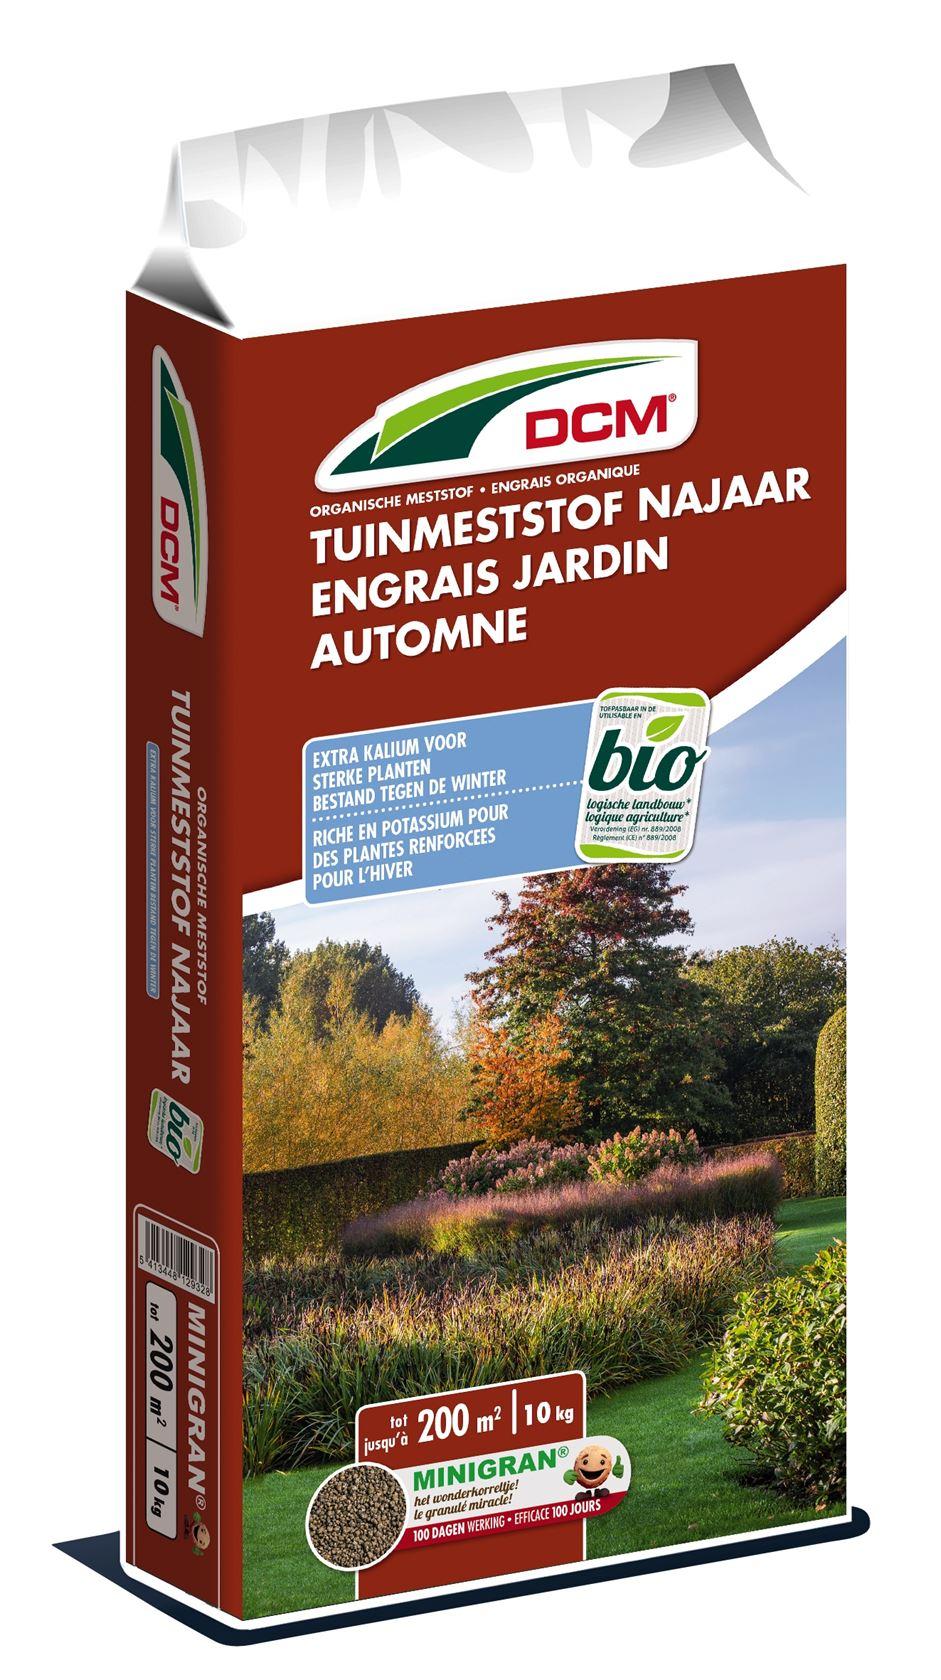 Universele-tuinmeststof-voor-het-najaar-met-extra-kalium-10kg-Bio-NPK-5-4-15